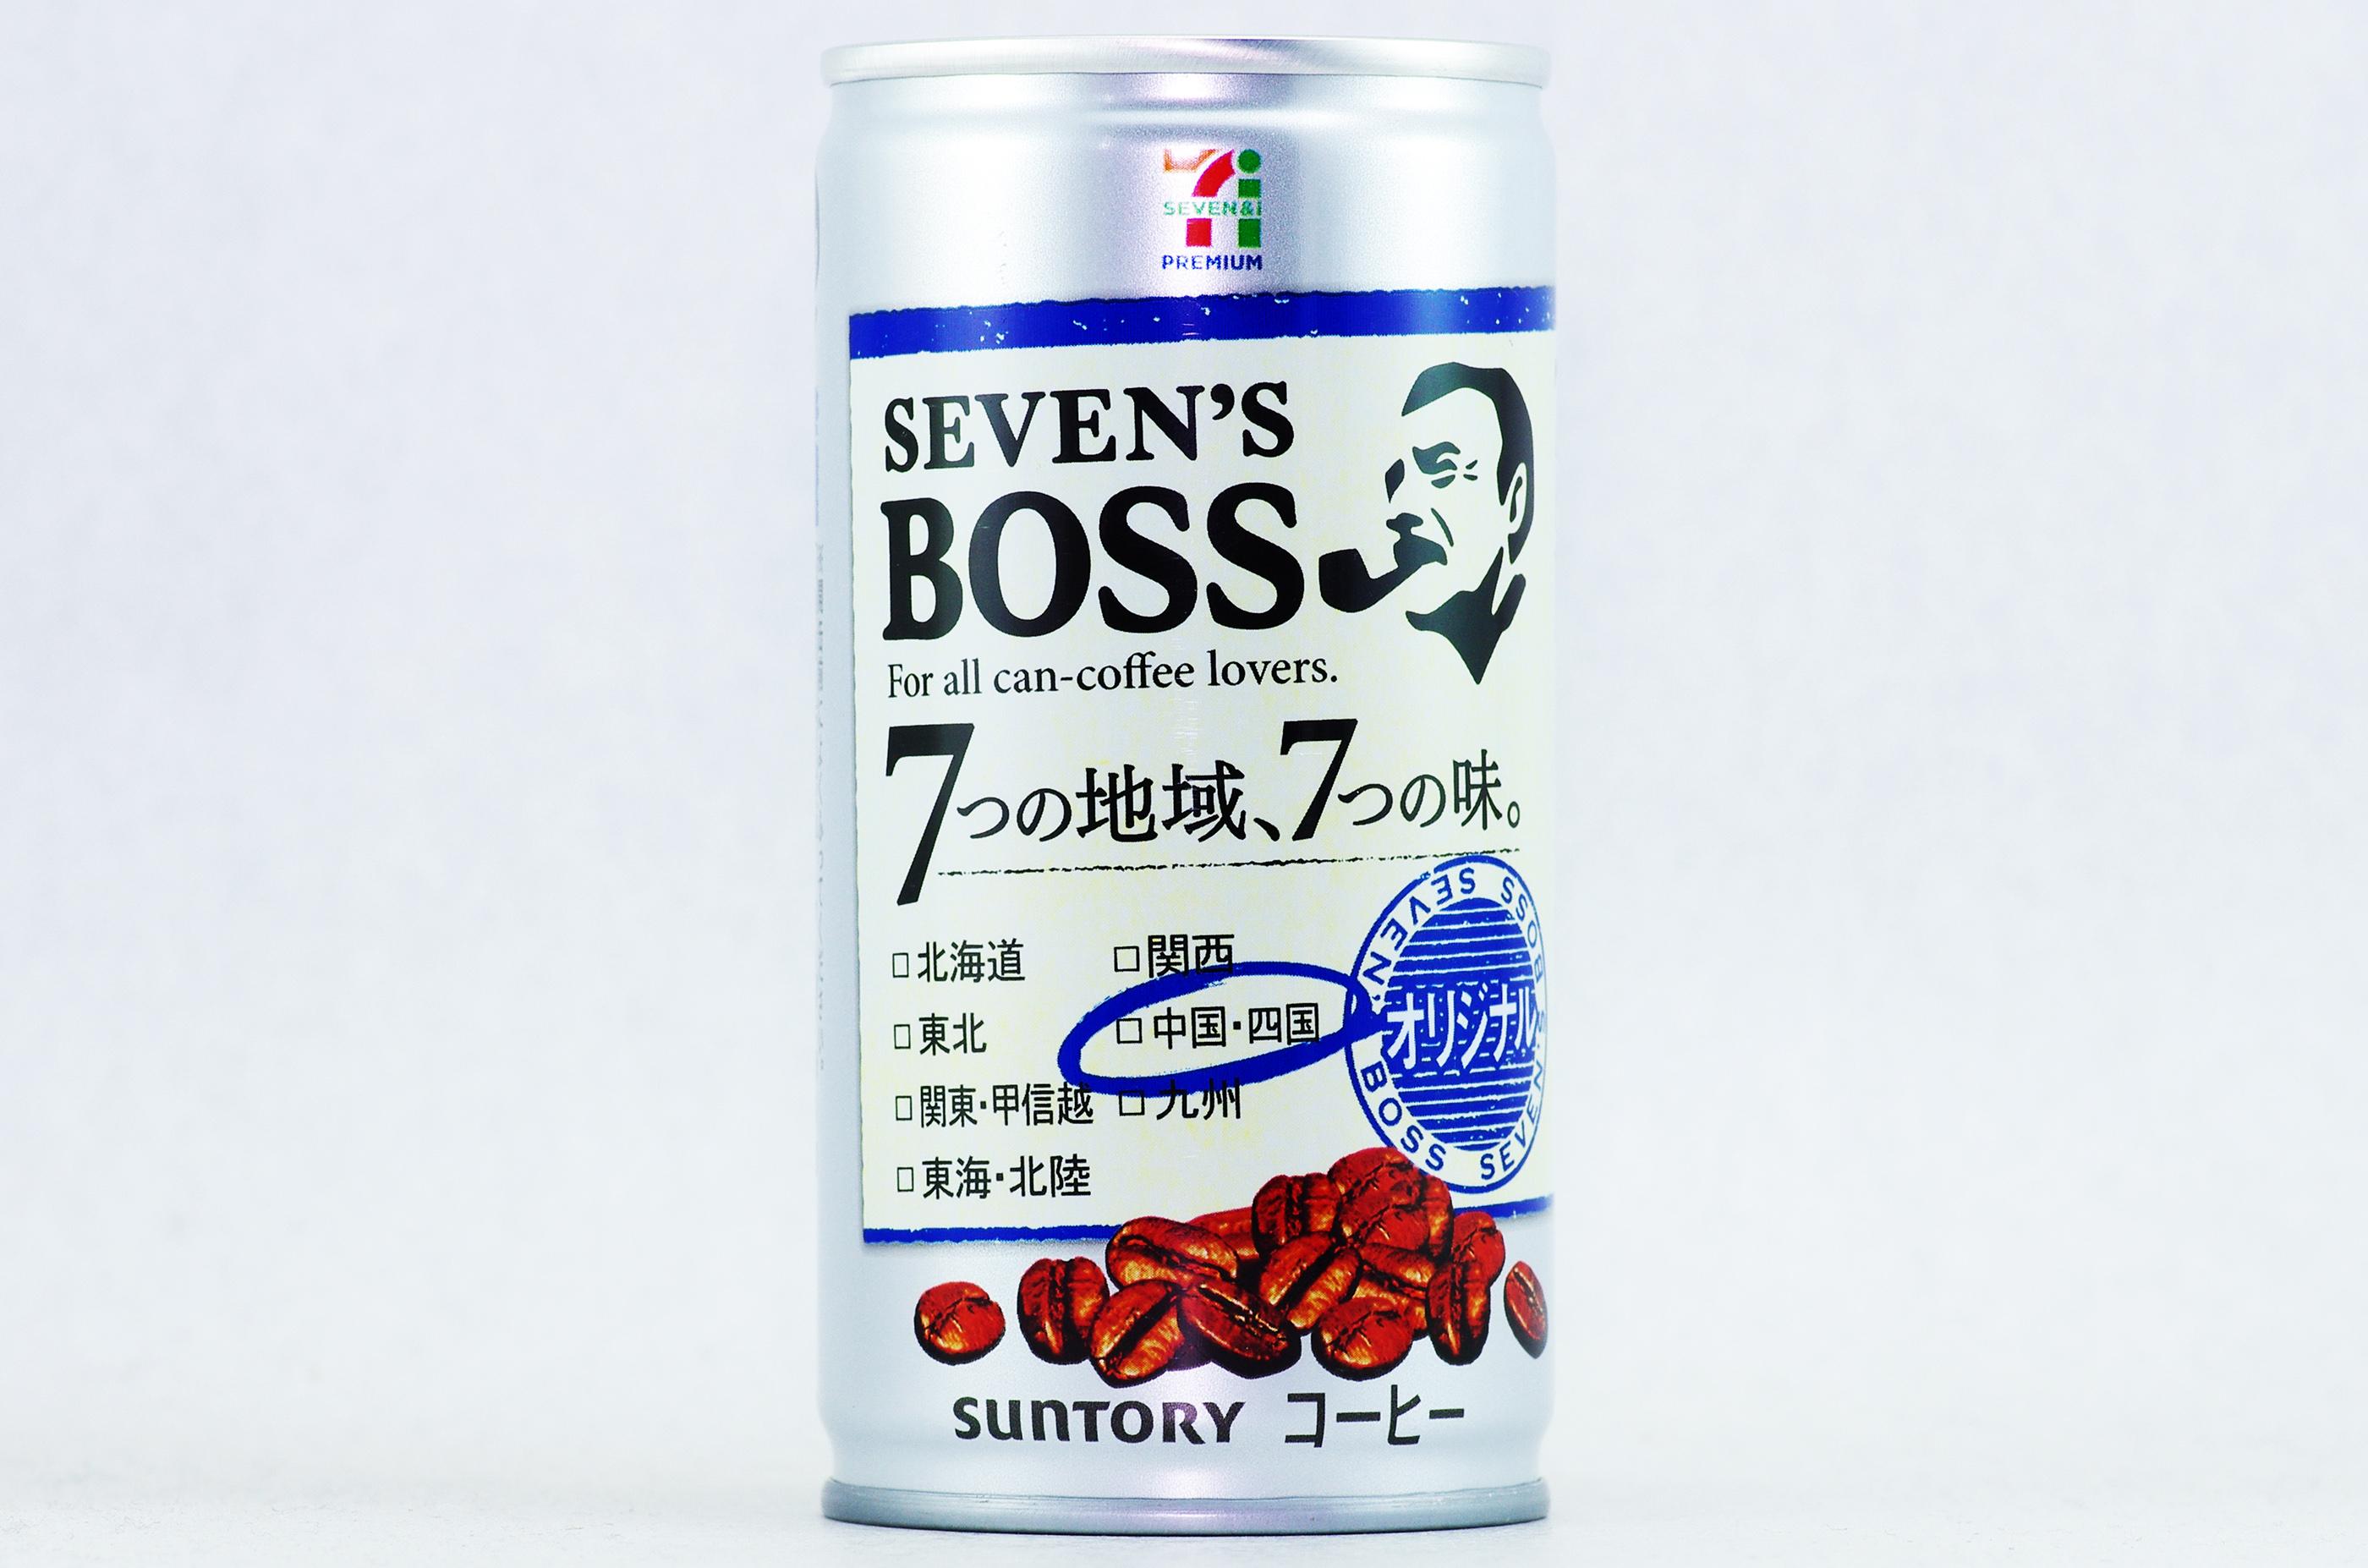 SEVEN'S BOSS オリジナル 中国・四国限定 前回登録品